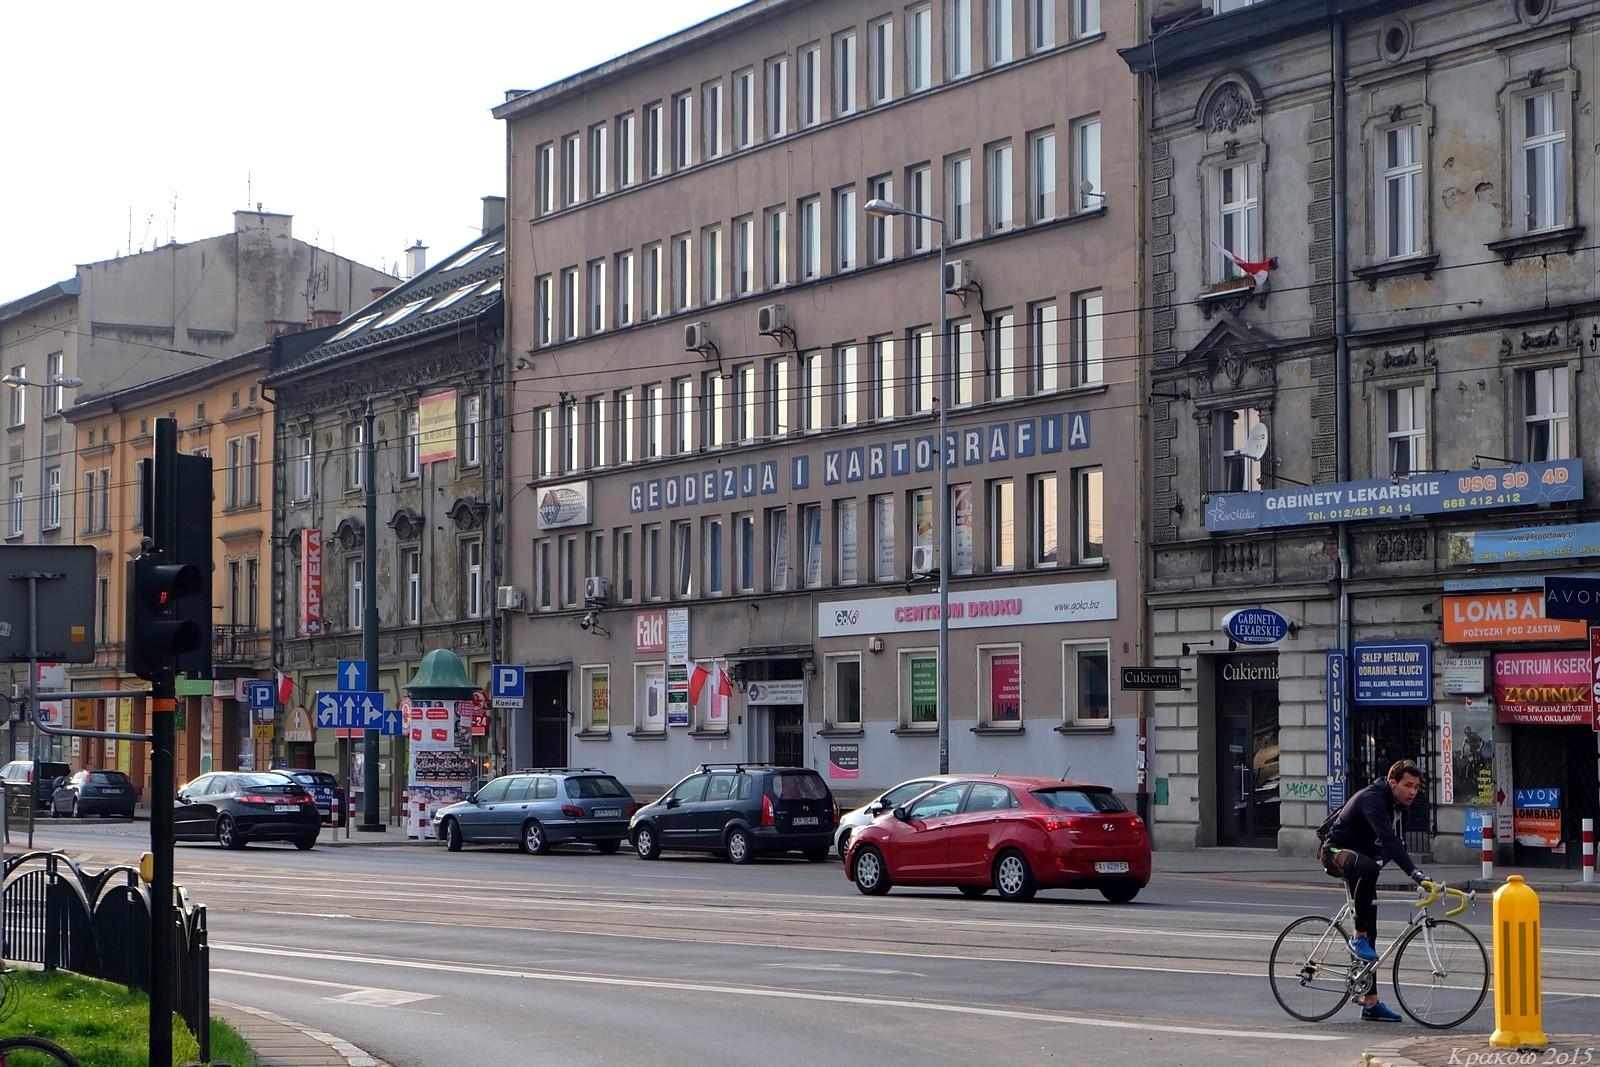 Geodezja i kartografia, Krakow, Poland